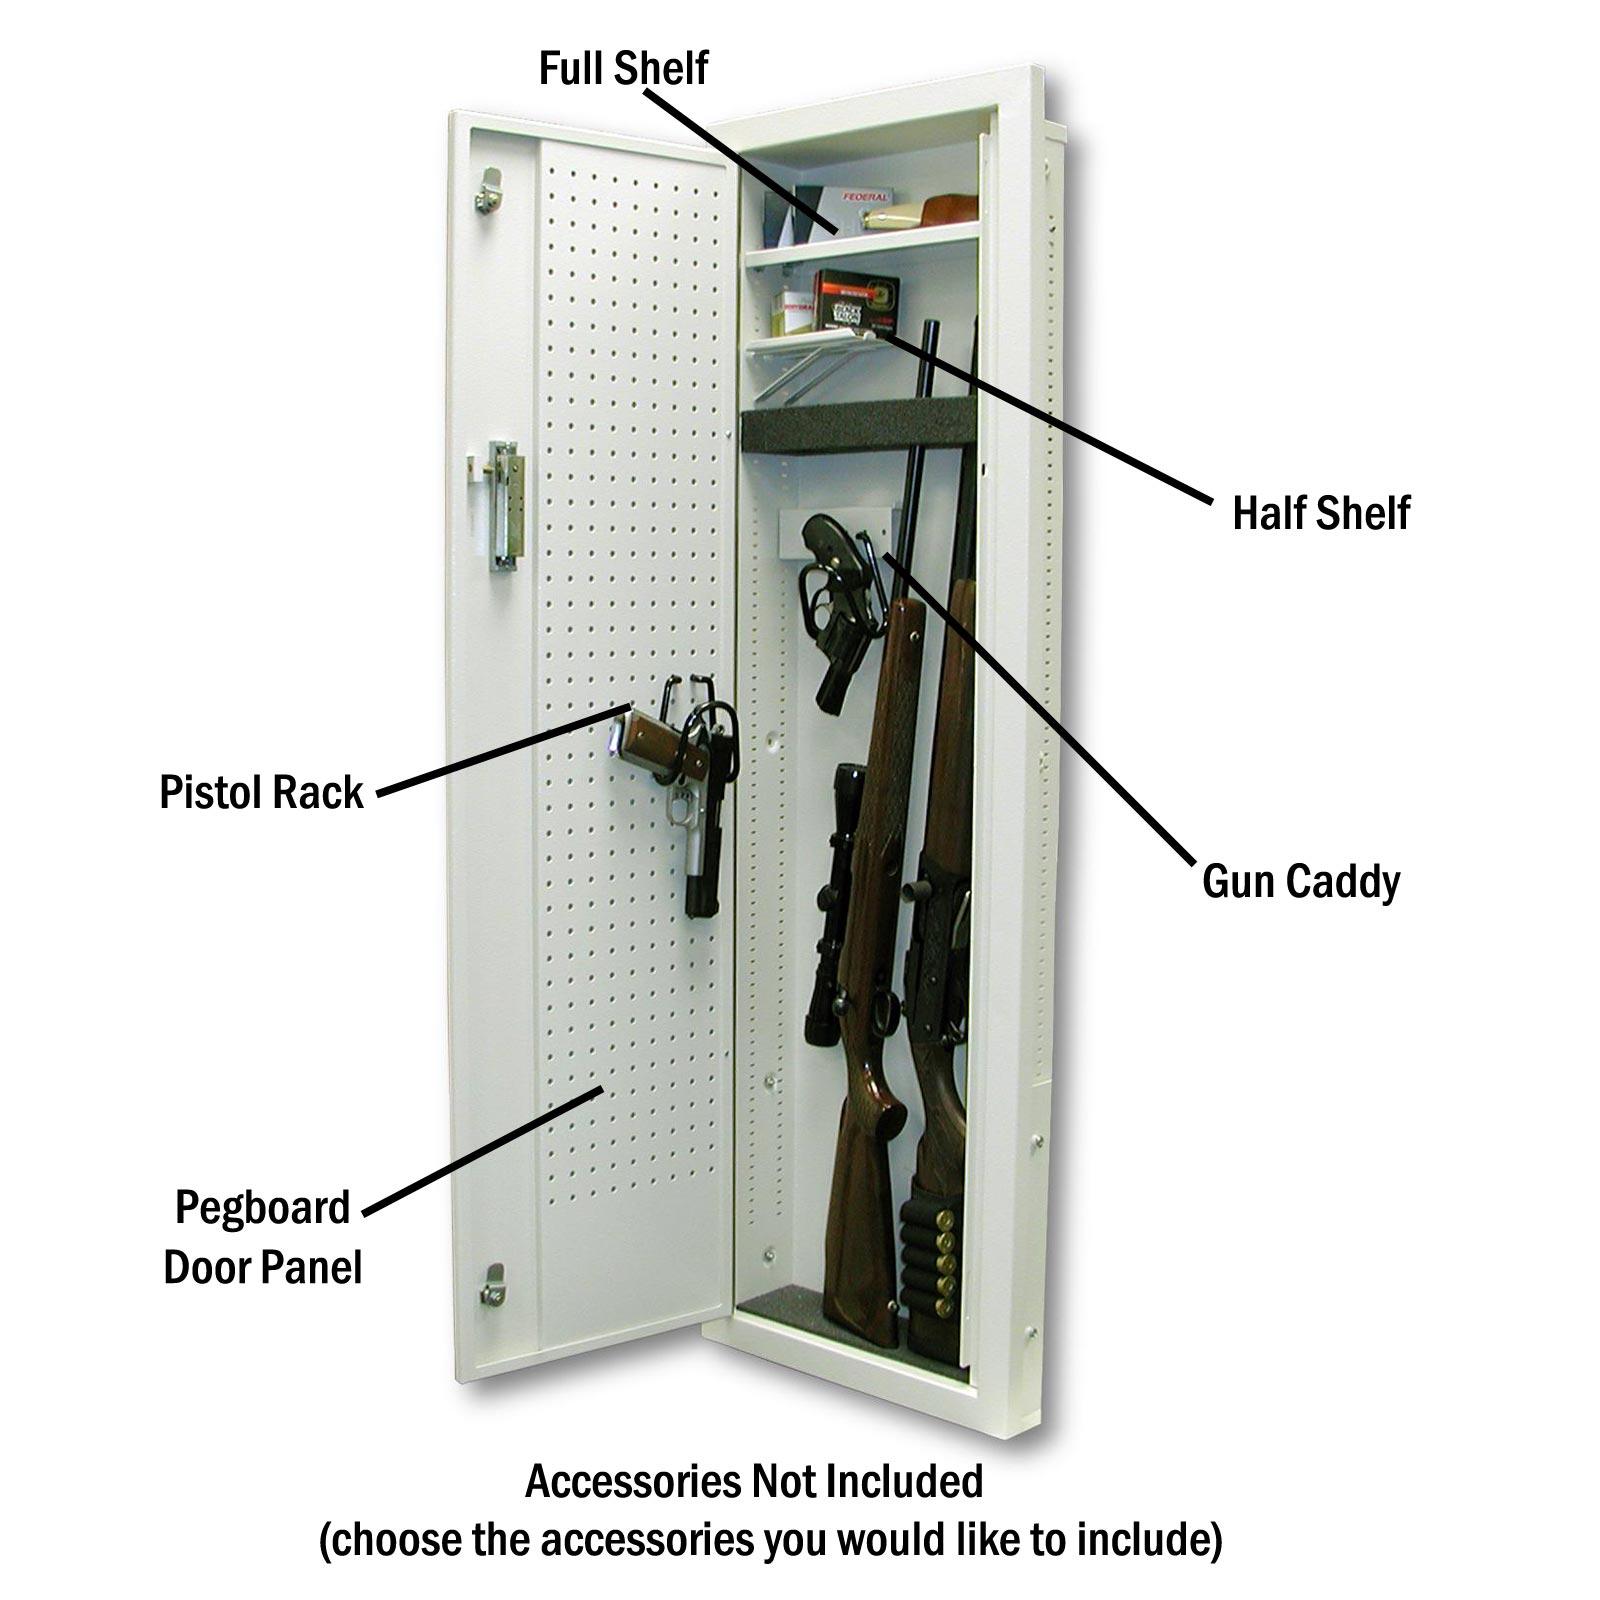 V Line 51653 Fs Adjule Full Shelf Add On For Closet Vault